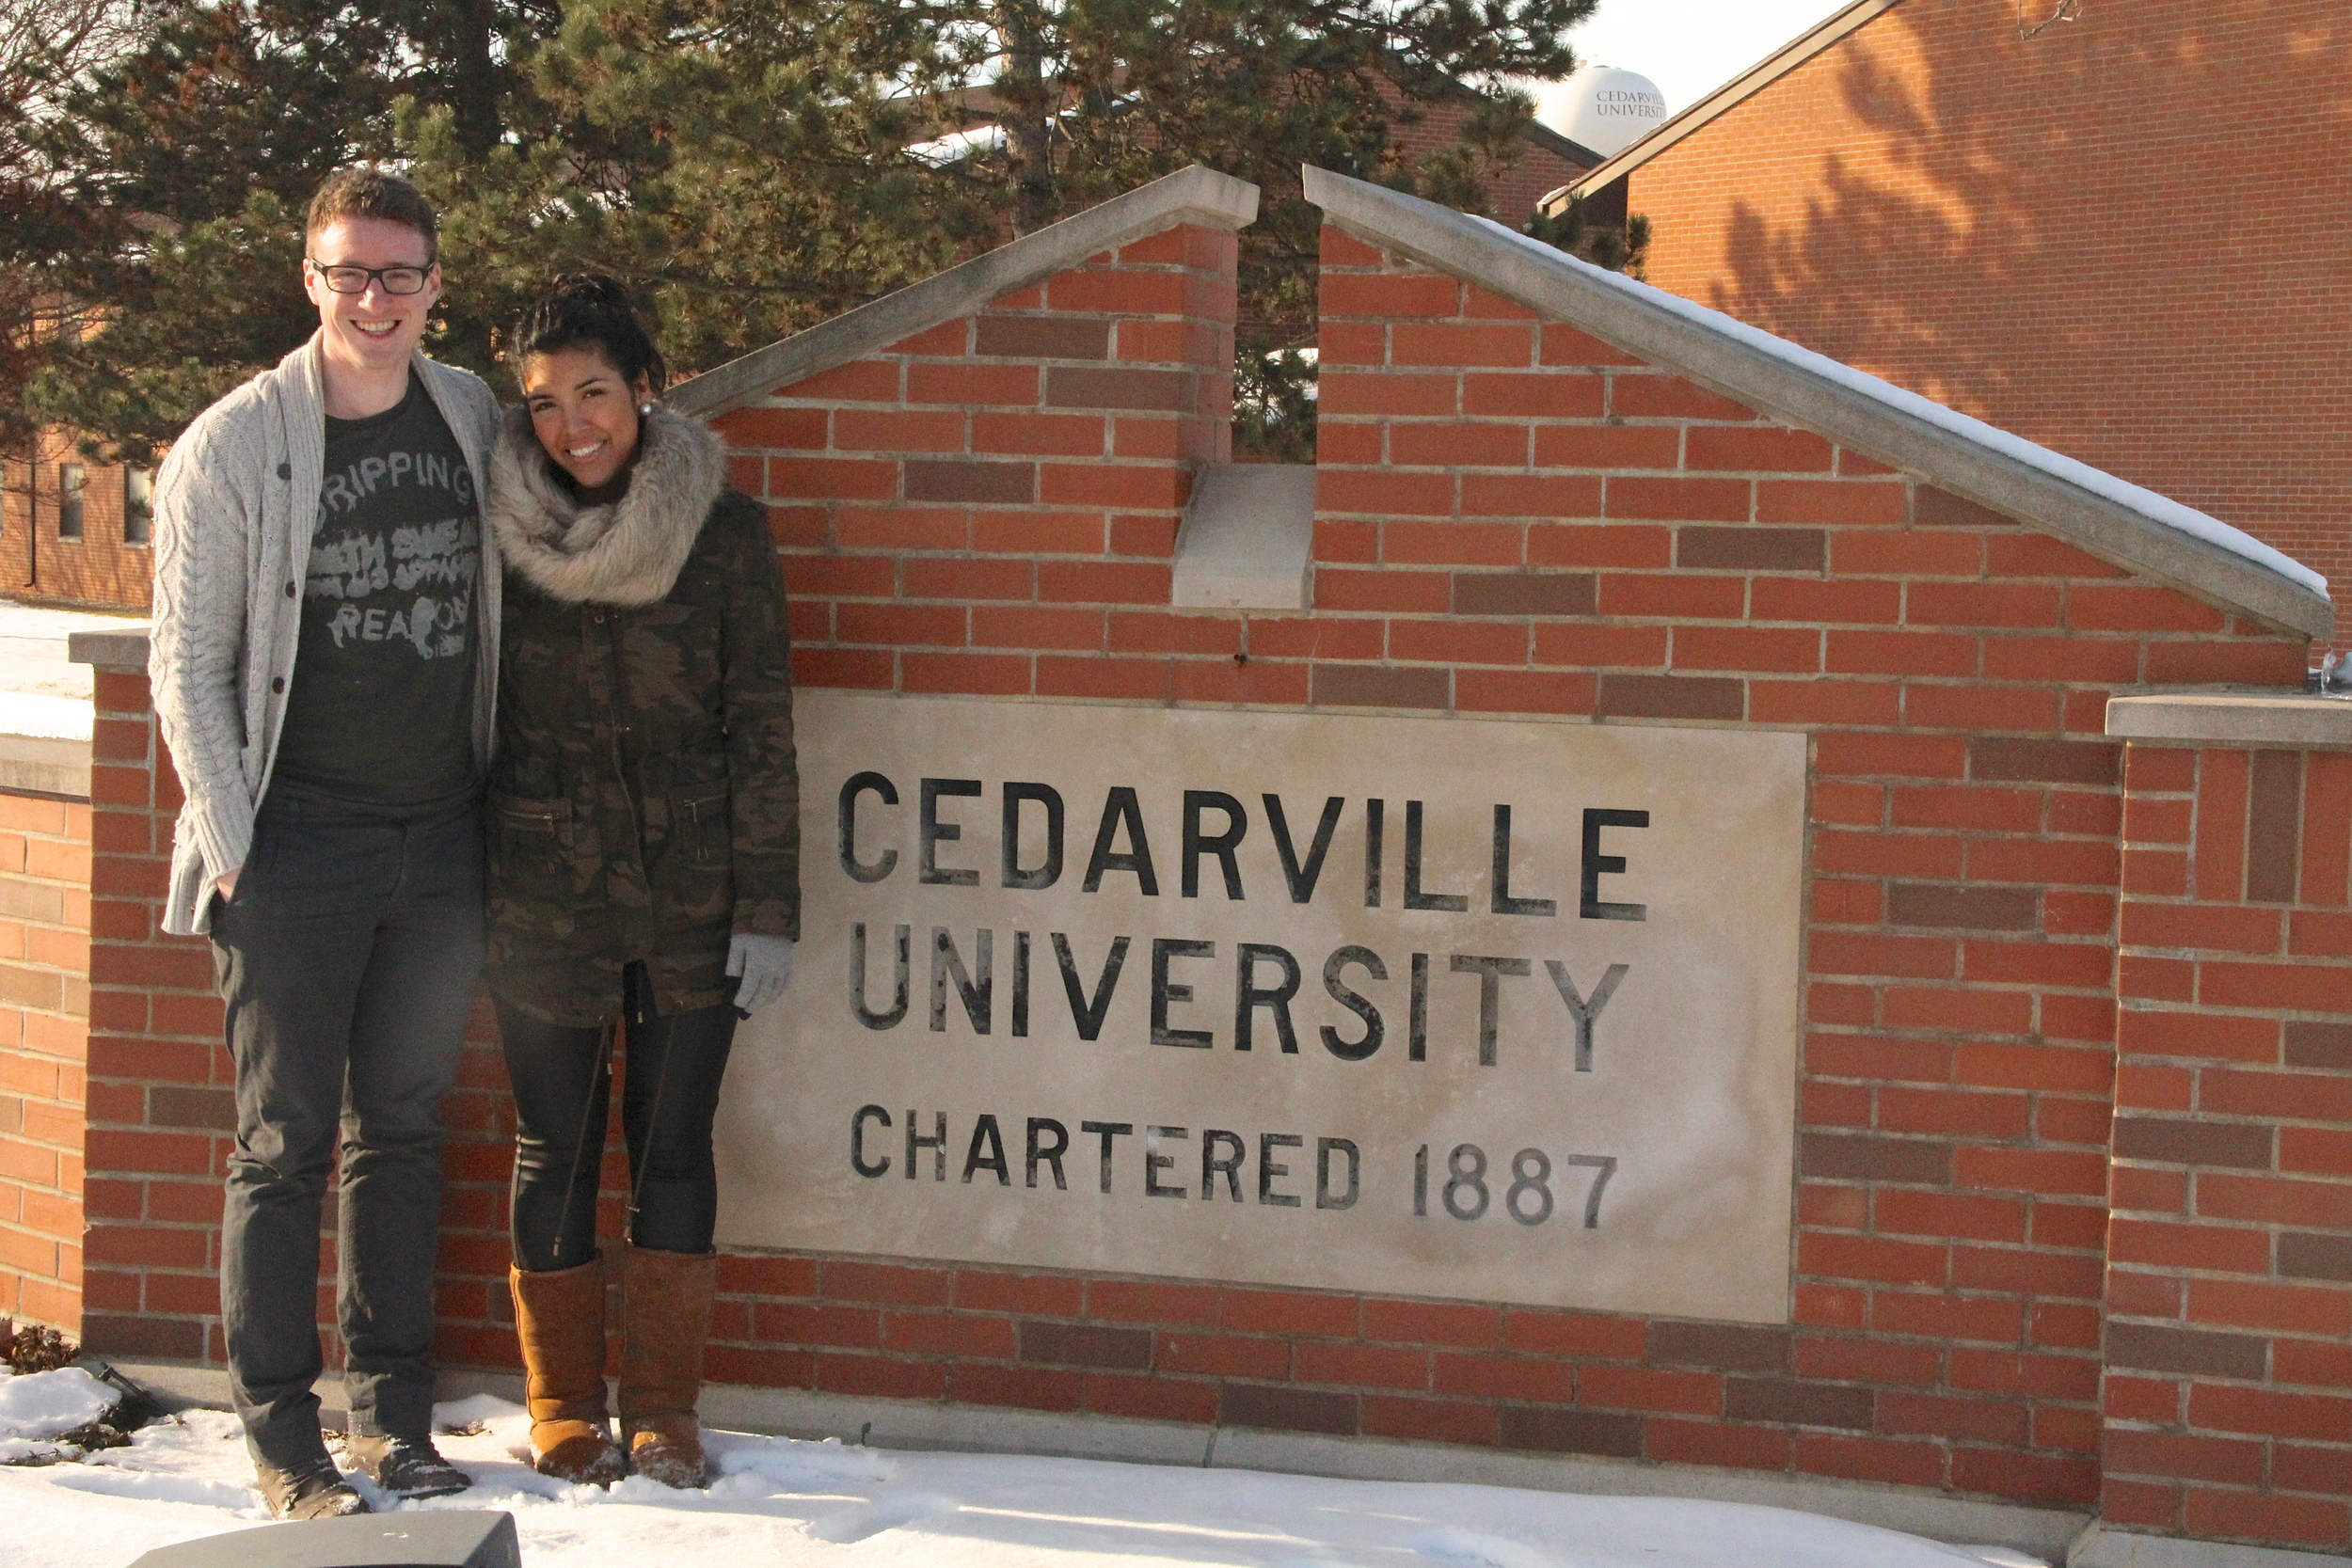 Cedarville University // Image byEduardo Julca